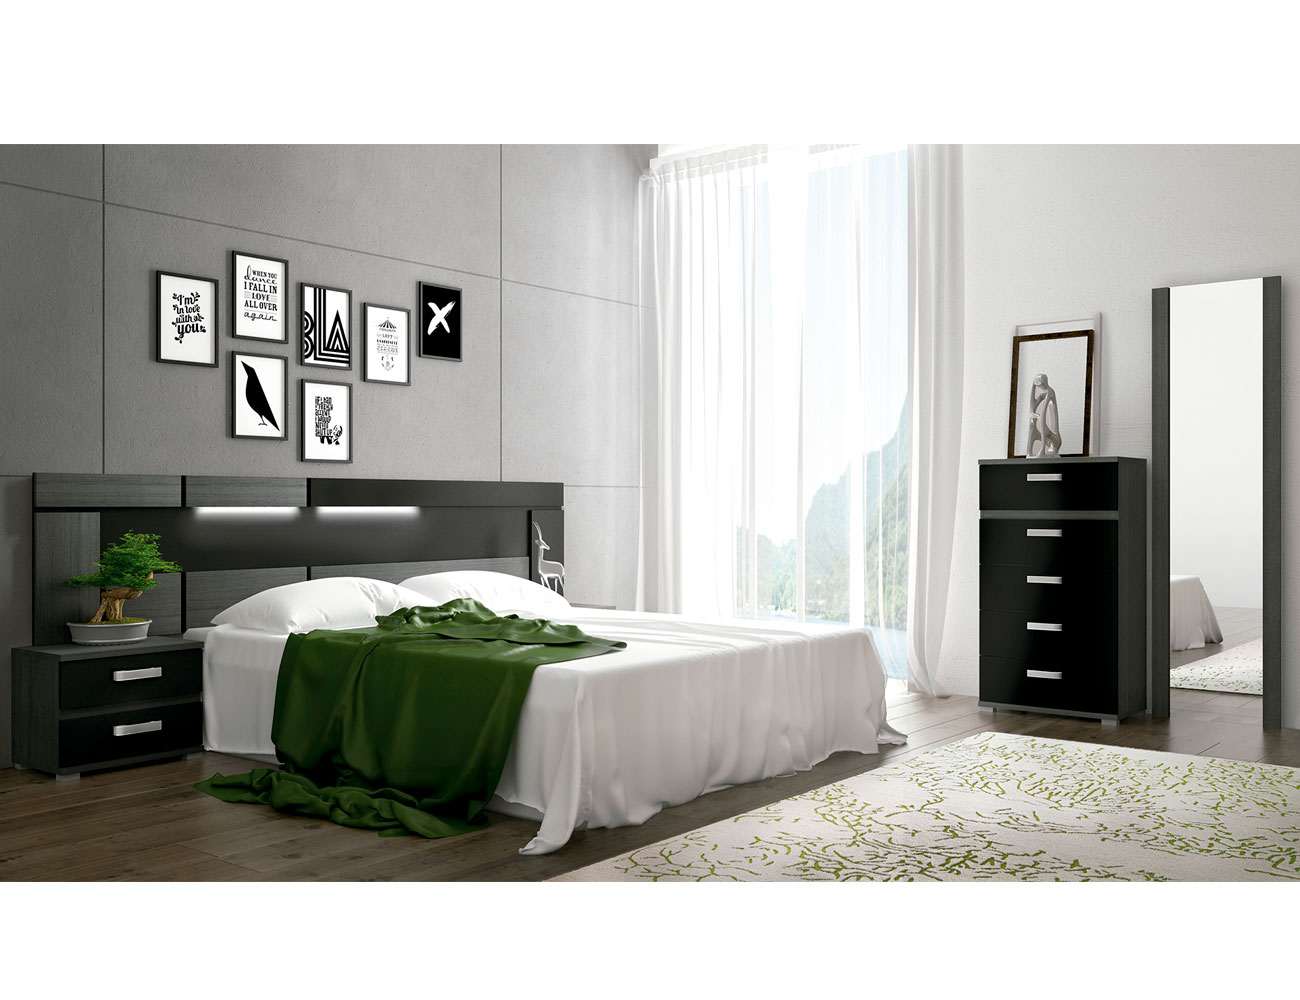 Dormitorio matrimonio ceniza negro cabecero tapizado rambla 1